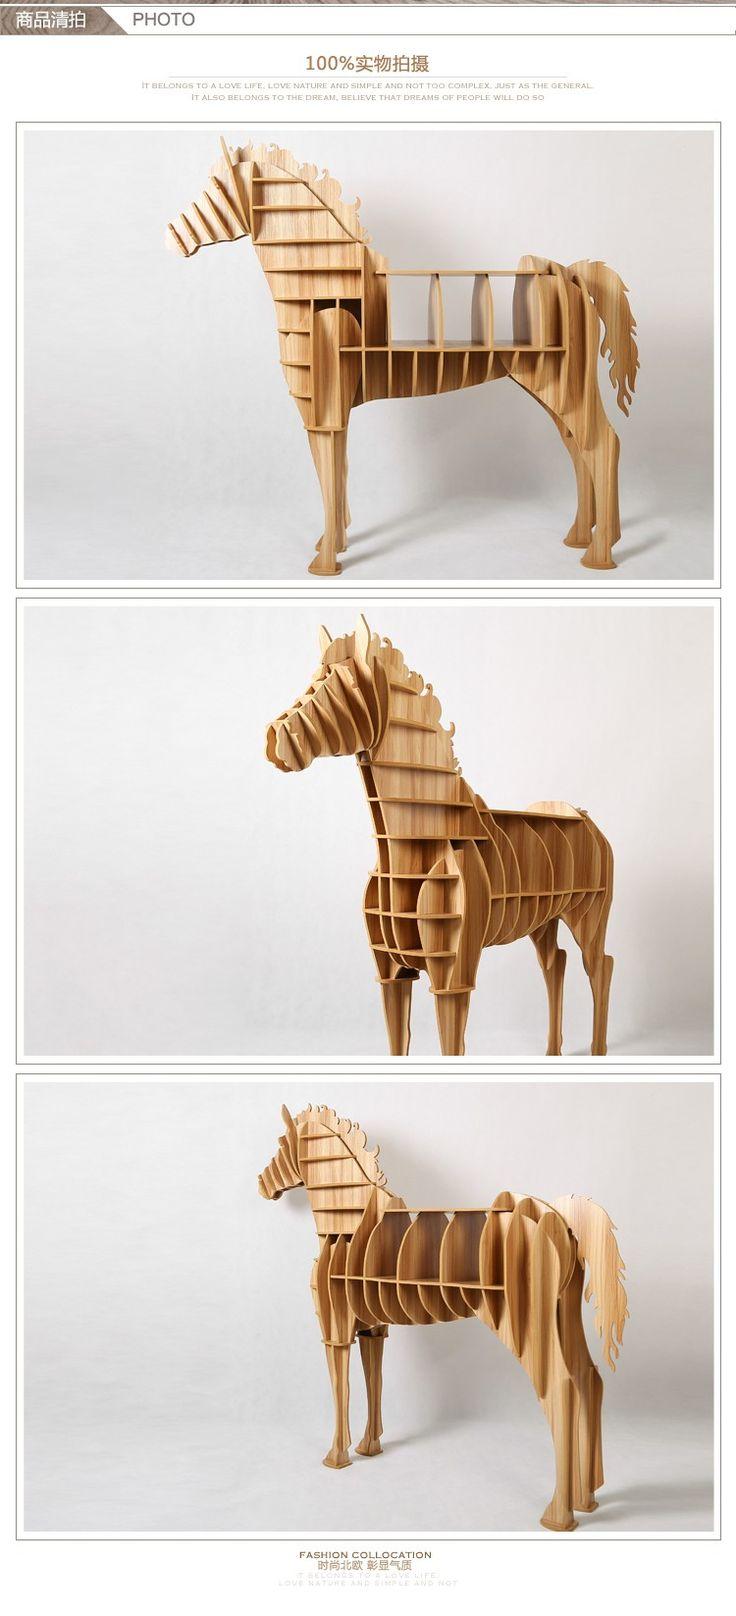 De gama alta de 9 mm de escritorio del caballo caballo de café de madera caballo estanterías muebles a estrenar TM013M en Wood Crafts de Casa y Jardín en AliExpress.com | Alibaba Group